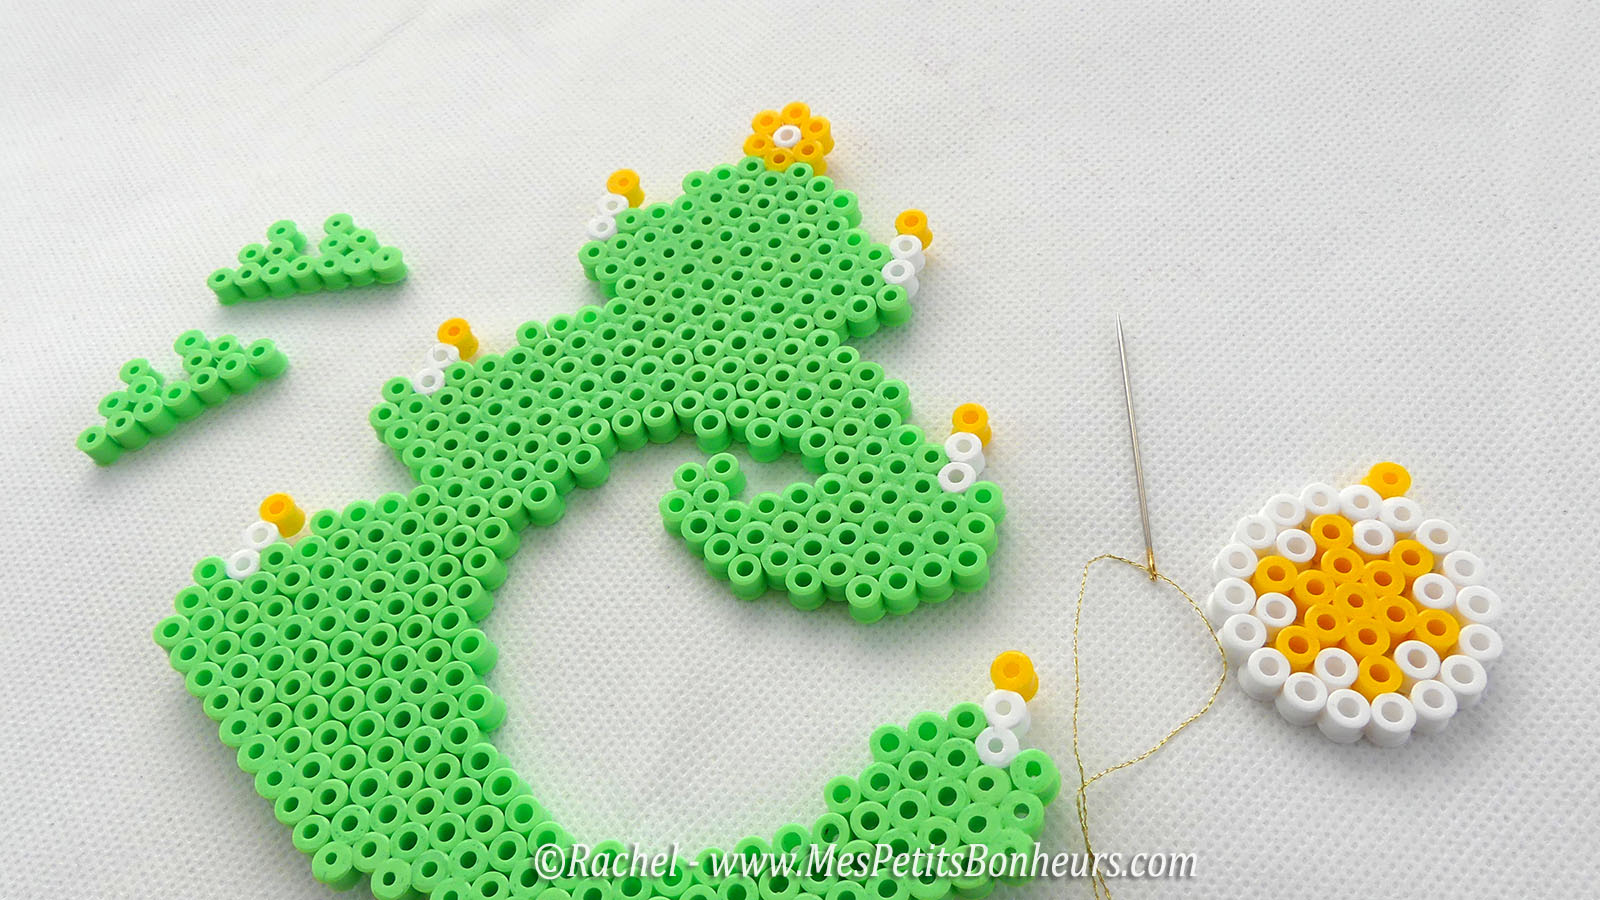 sapin-noel-perles-hama-a-assembler